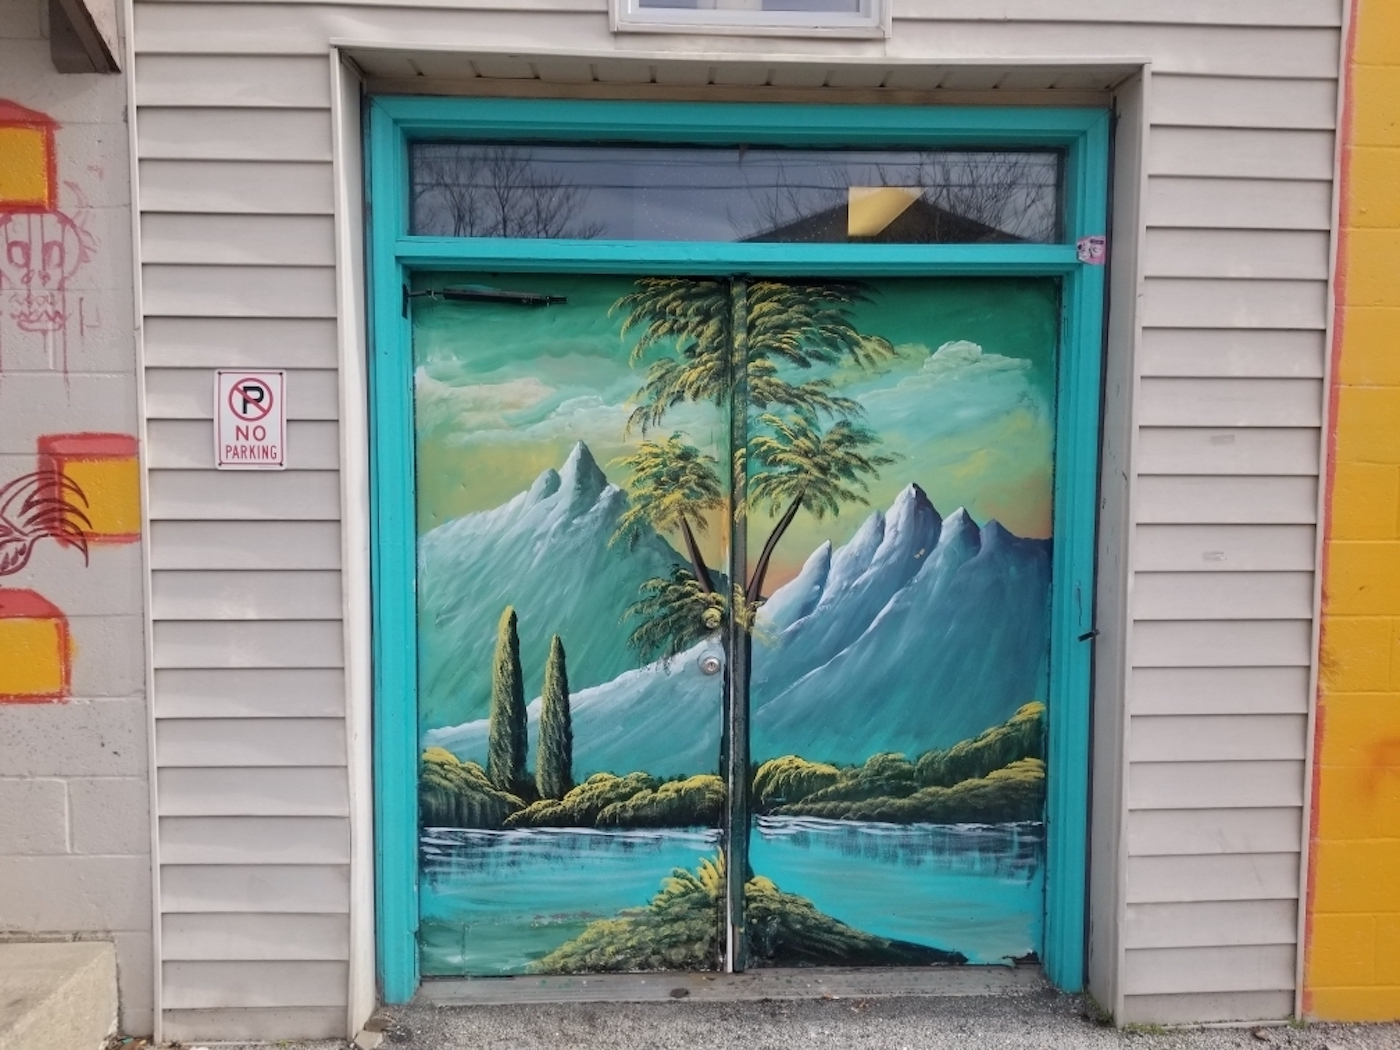 Artisan Alley, 'Entrance to Paradise' (2018), 222 W. 2nd St., artist — Haider Ali | Courtesy photo